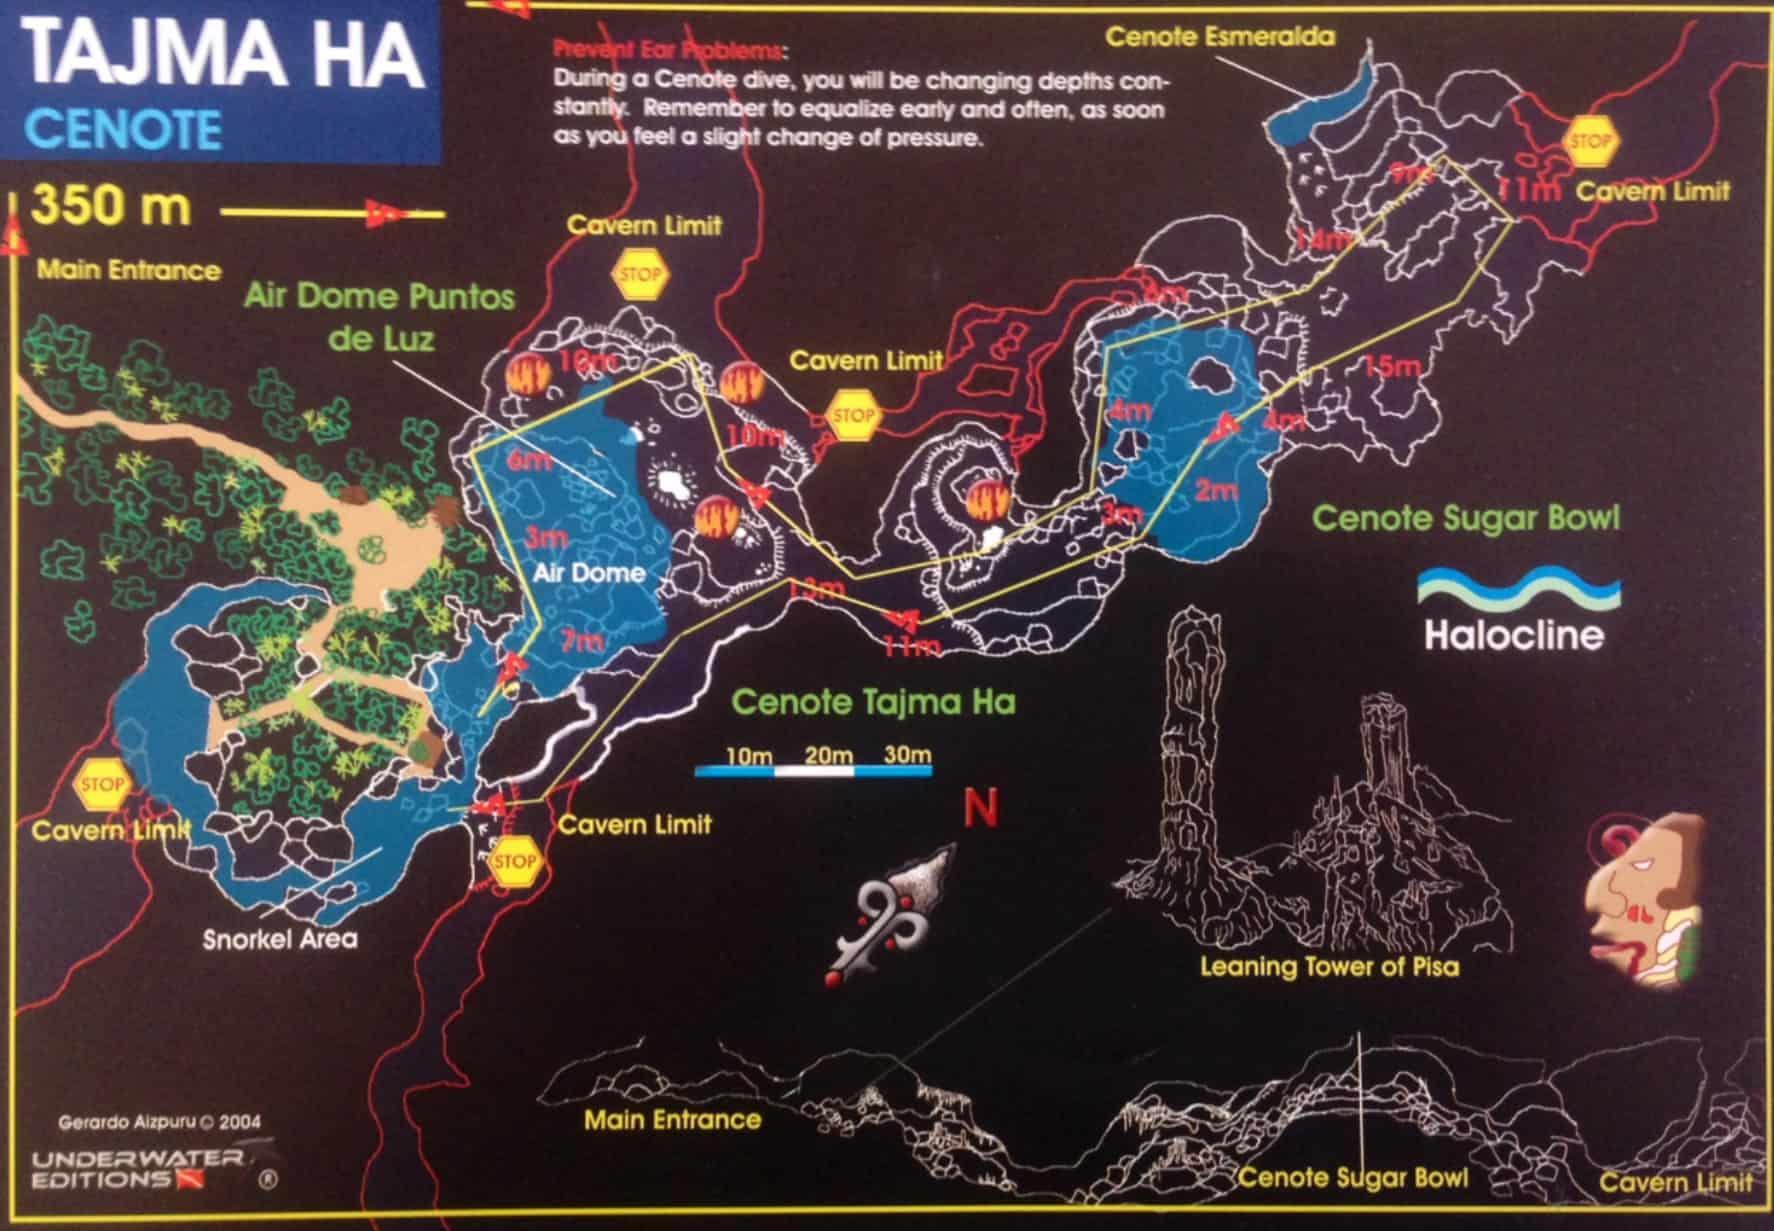 Cenote layout Tajma Hal